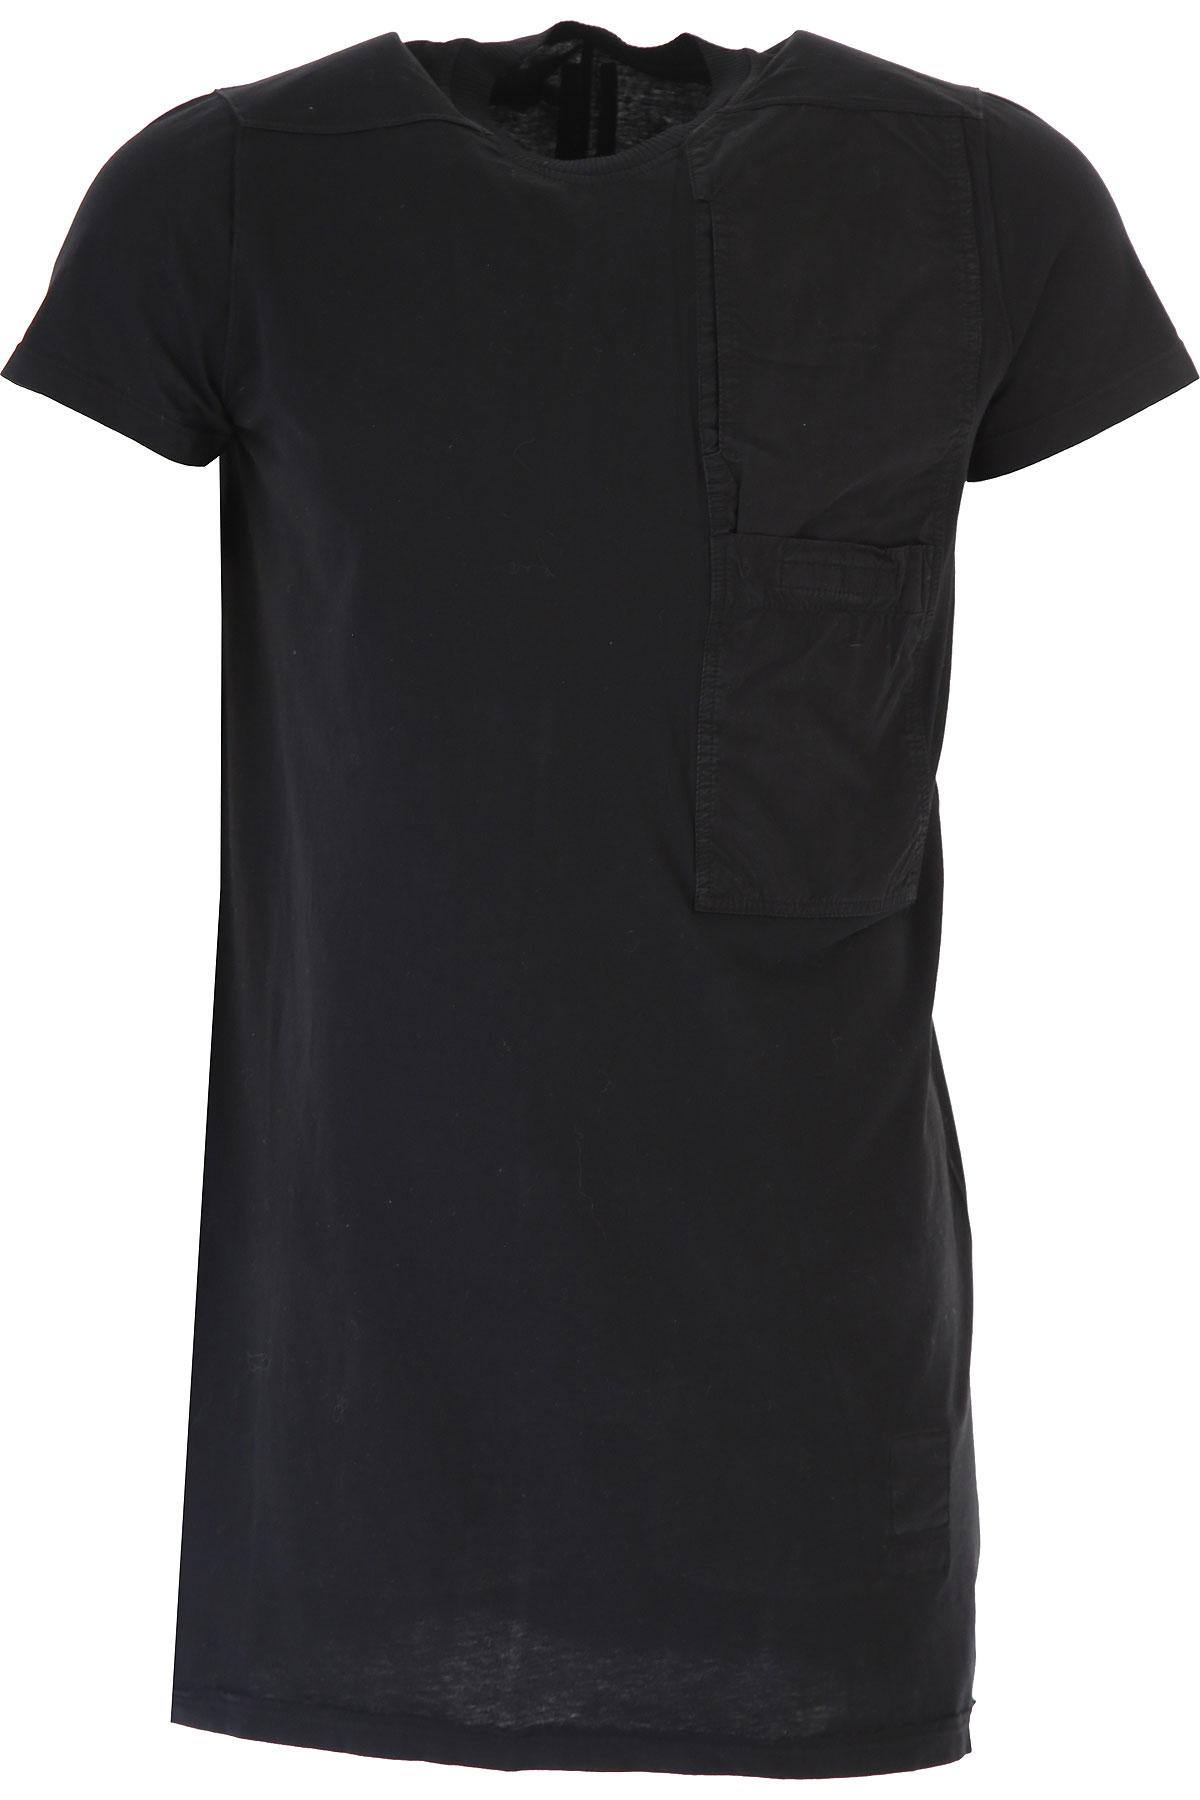 Rick Owens DRKSHDW T-Shirt for Men On Sale in Outlet, Black, Cotton, 2019, M S